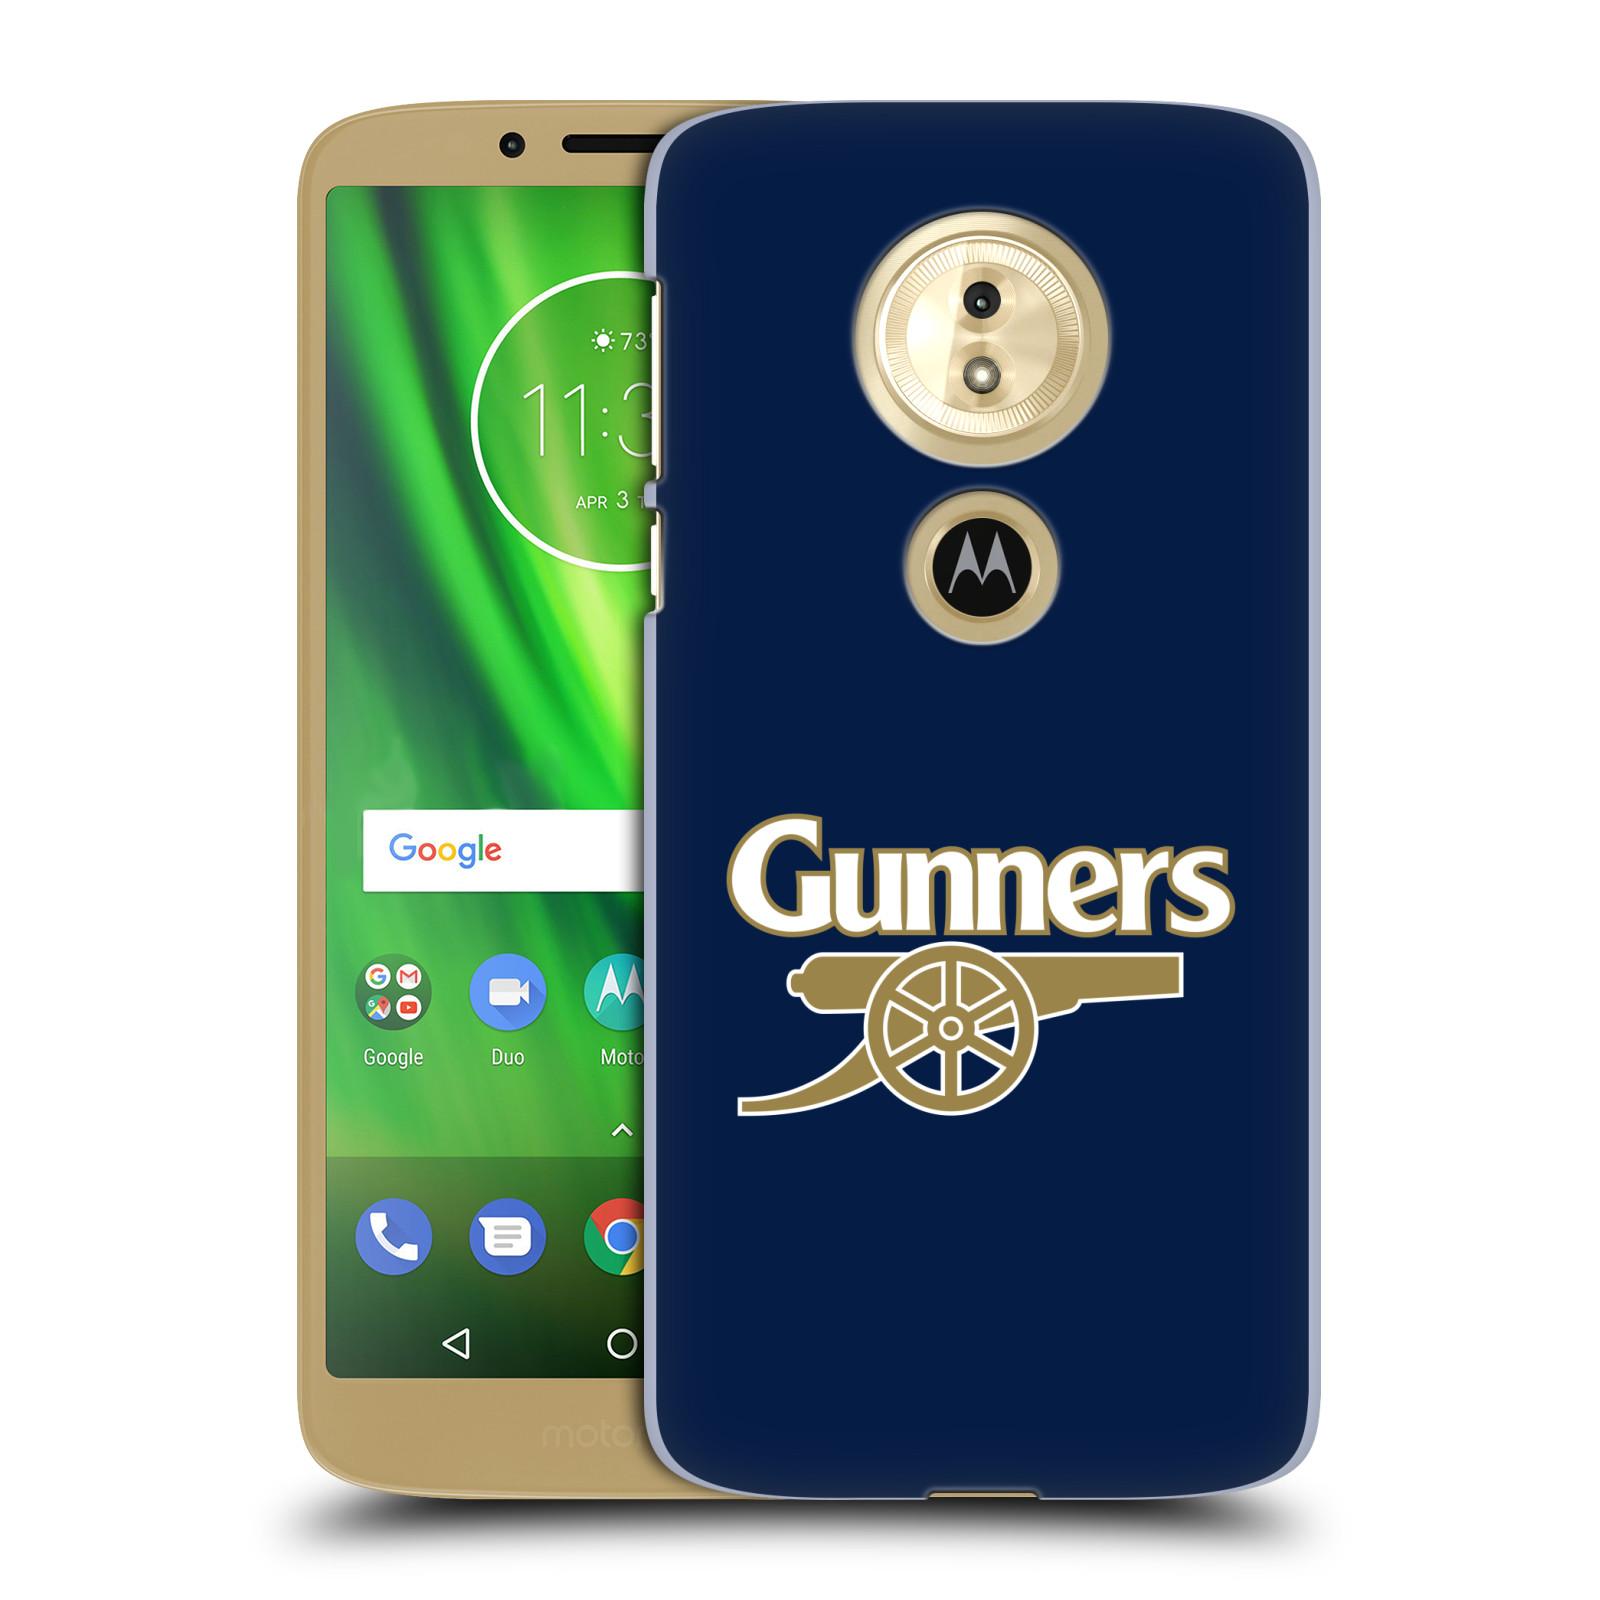 Plastové pouzdro na mobil Motorola Moto G6 Play - Head Case - Arsenal FC - Gunners